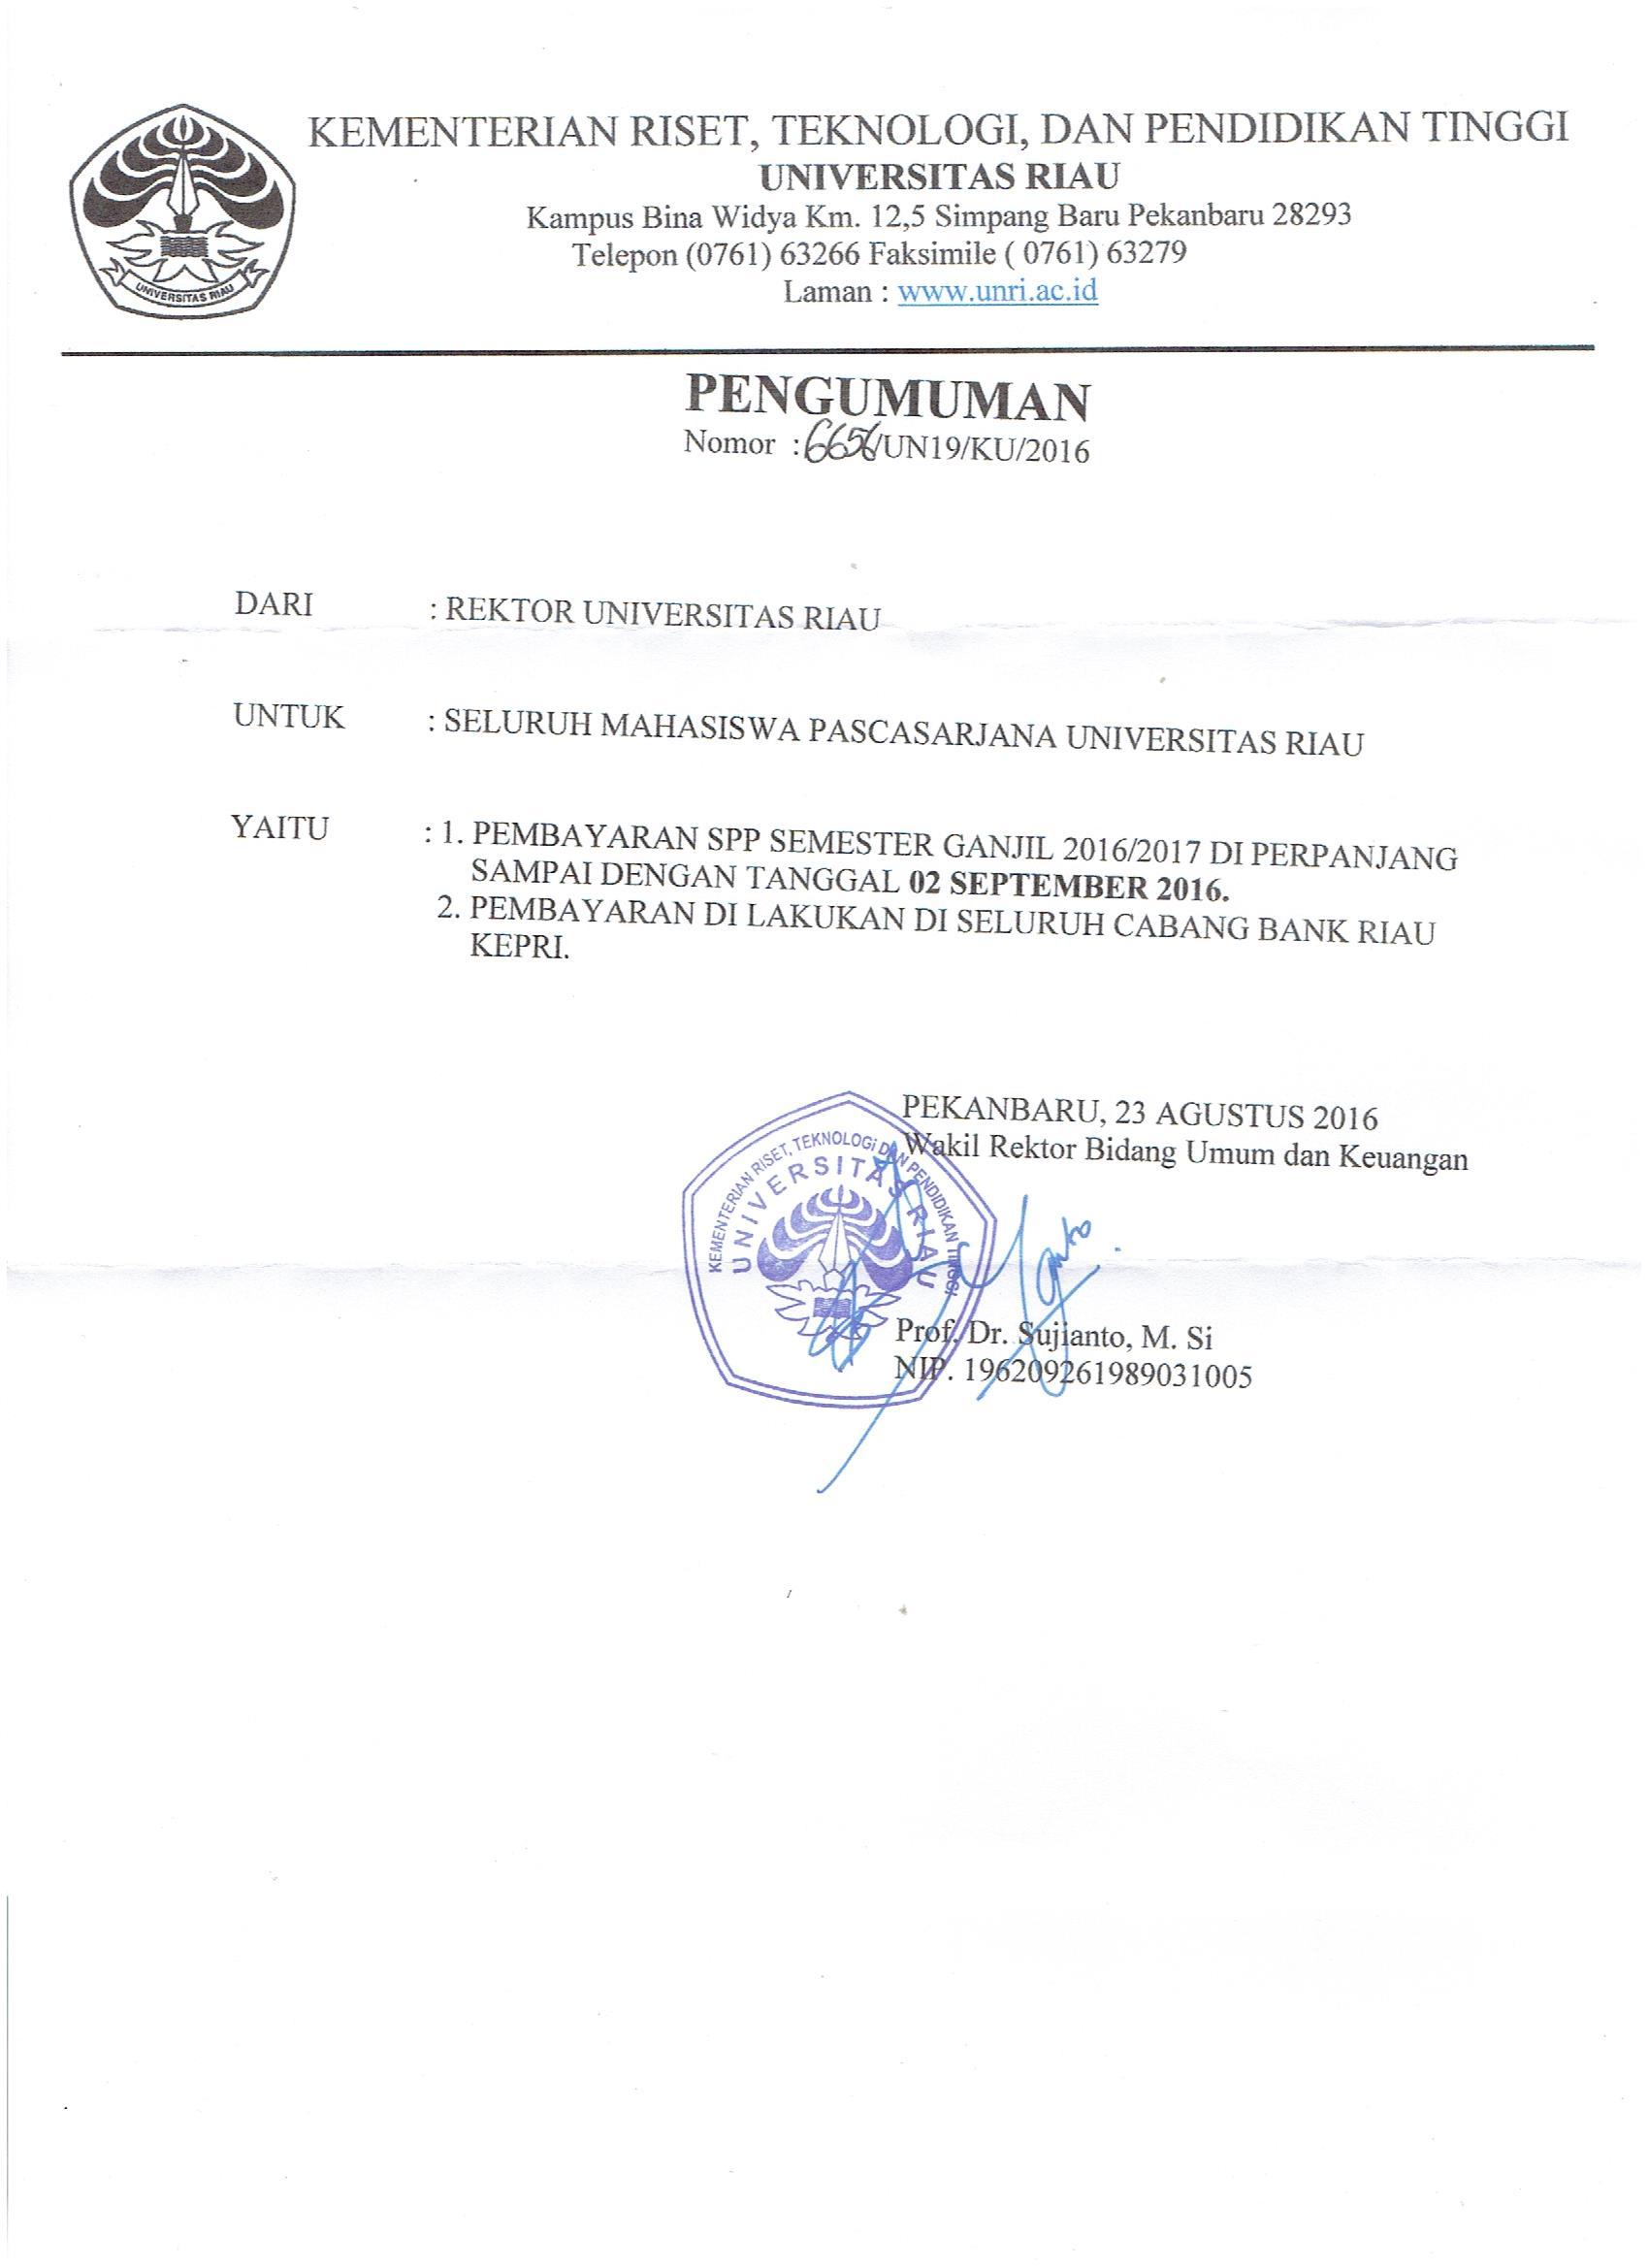 surat perpanjangan spp pasca